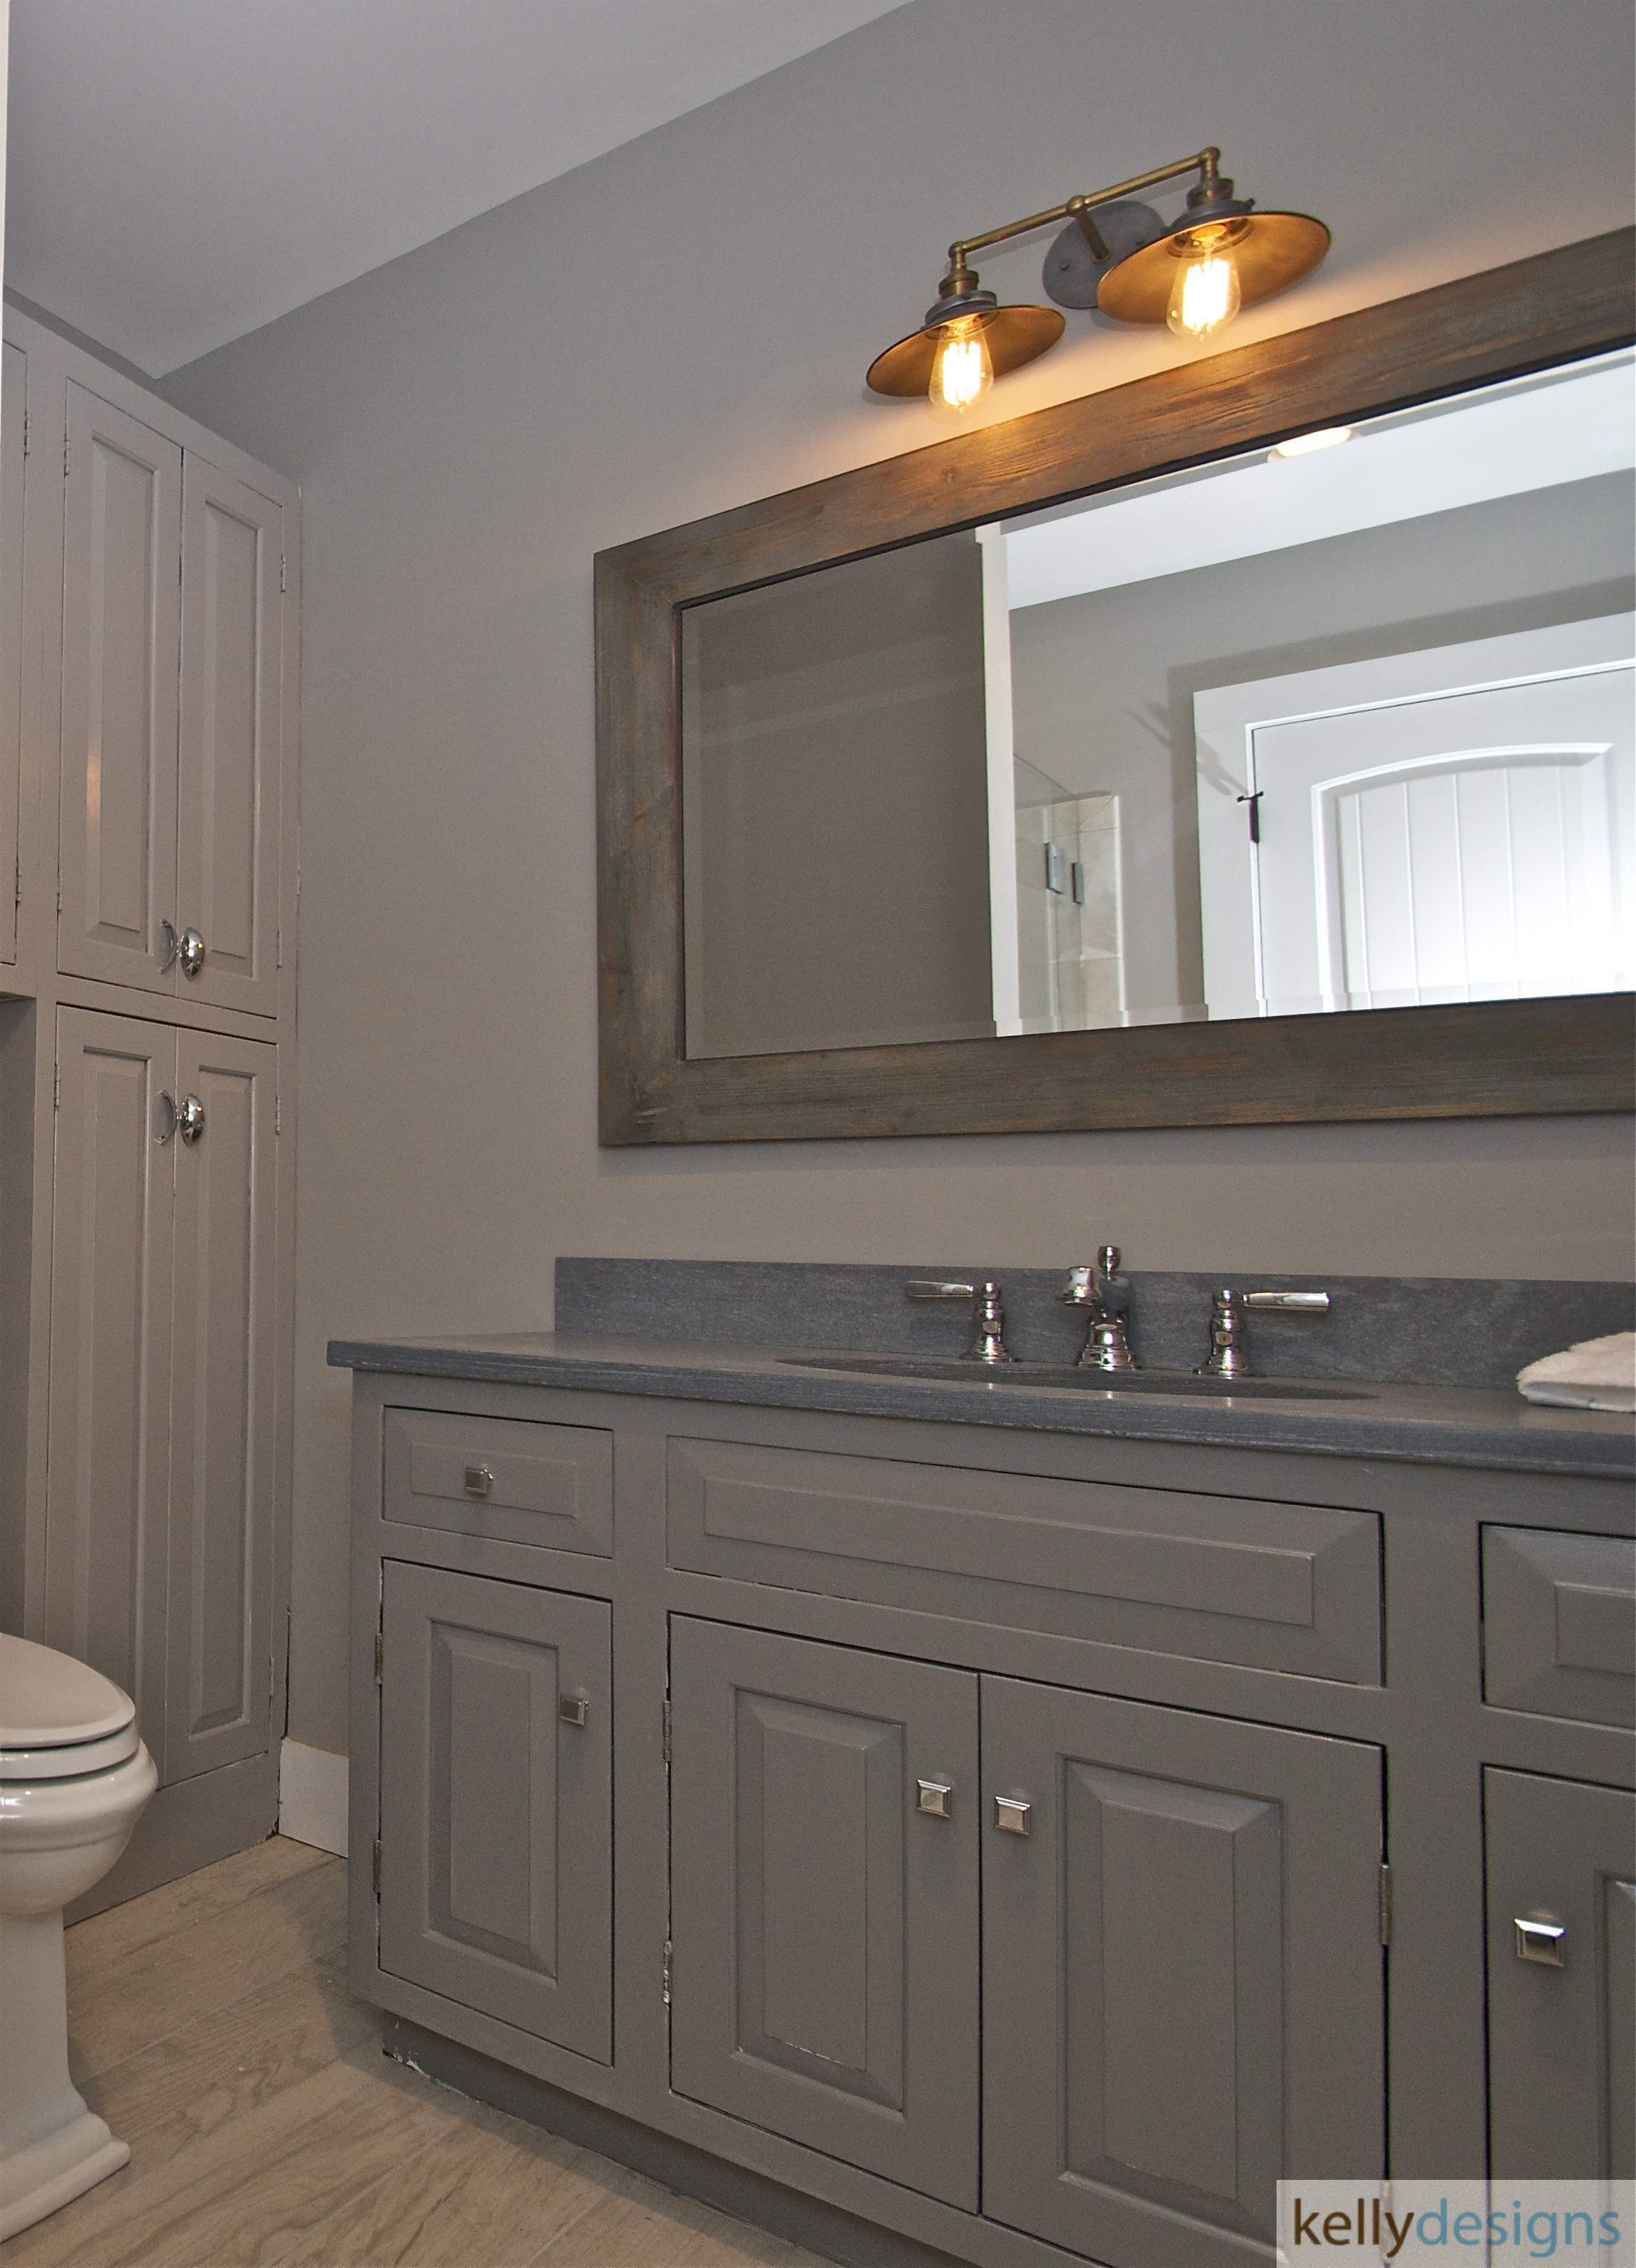 Redding Bath Remodel - Bathroom 1 - Interior Design by kellydesigns